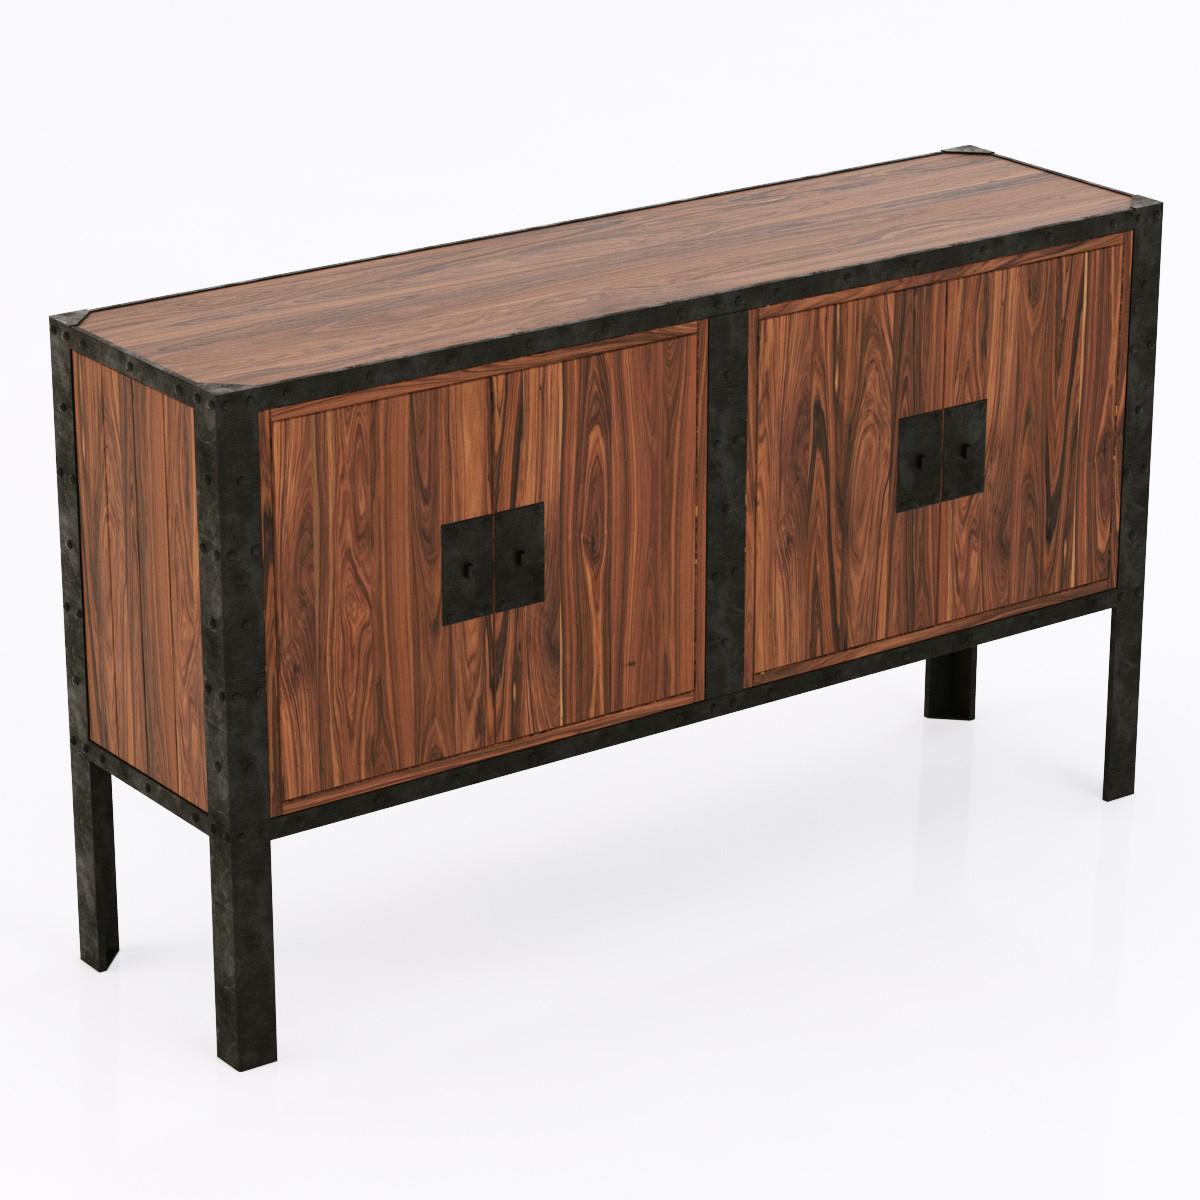 Dovetail Furniture Max